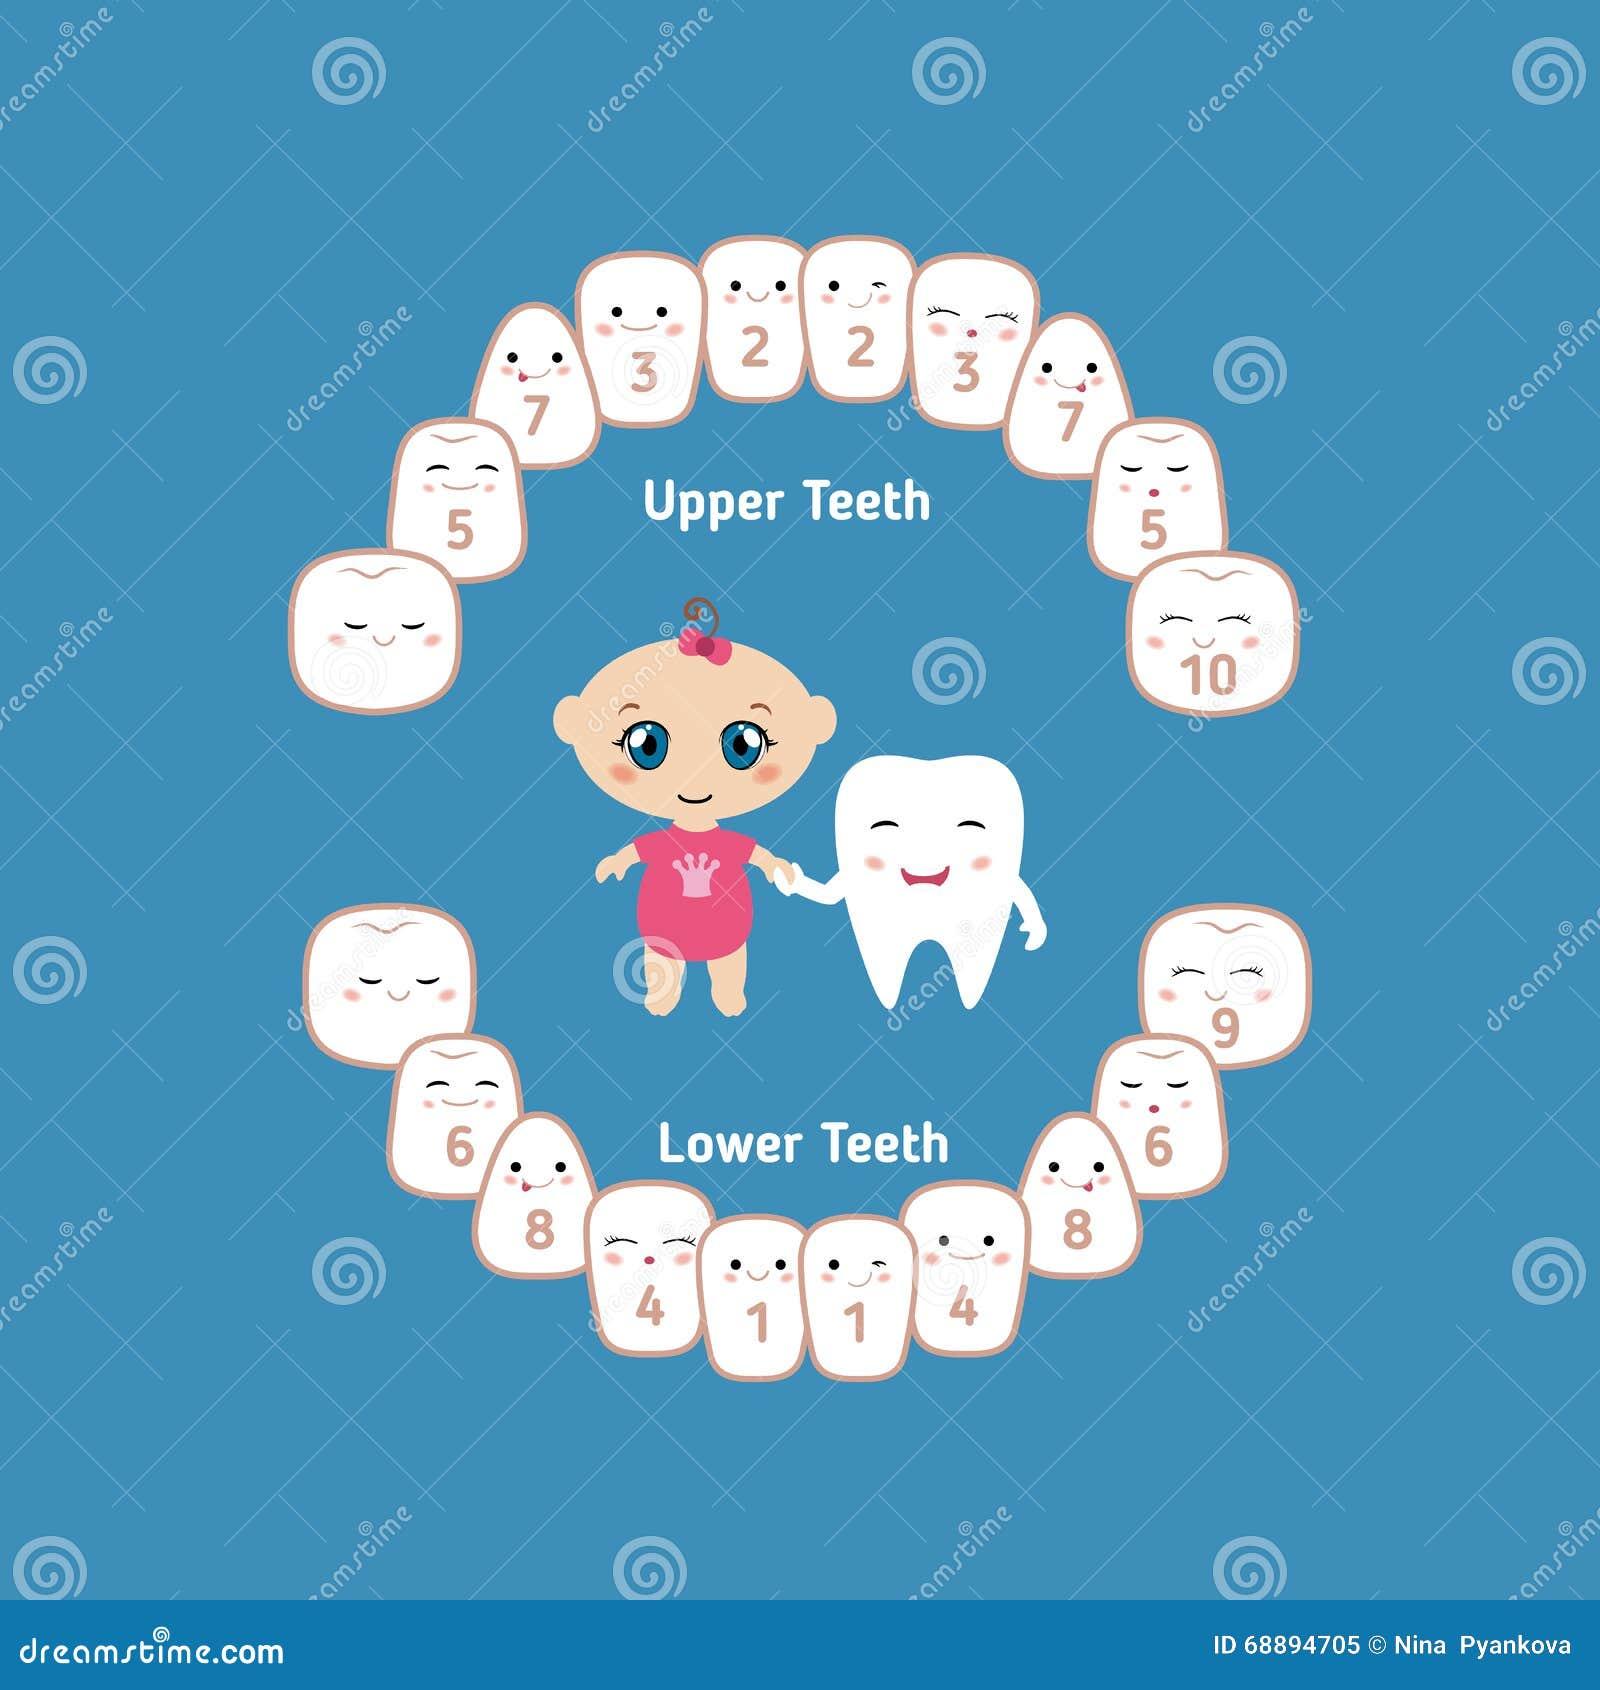 Baby Teeth Chart | Baby Teething Chart Stock Vector Illustration Of Chart 68894705